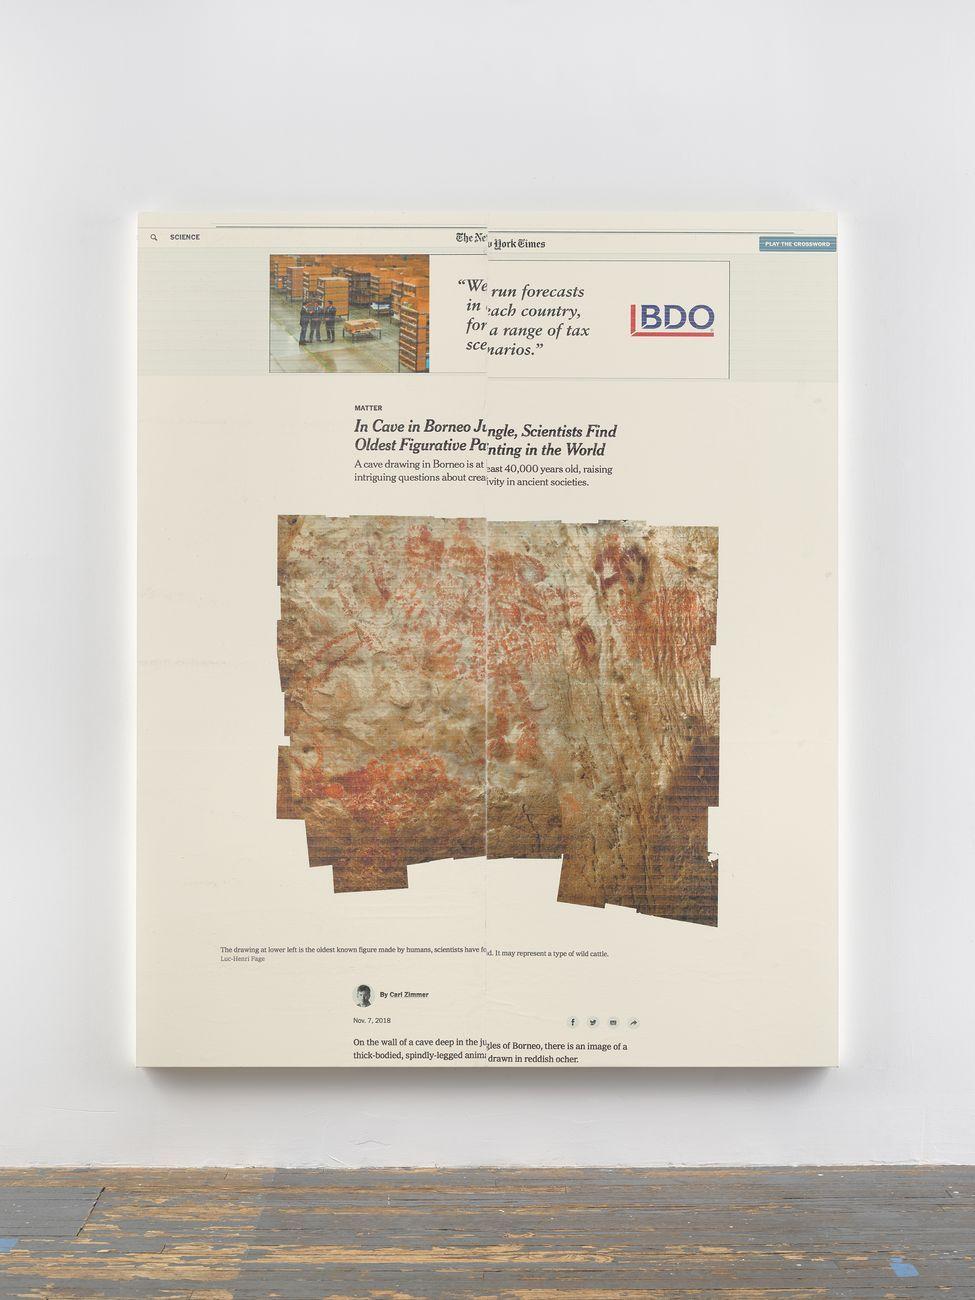 Wade Guyton, Untitled, 2018, stampa inkjet Epson UltraChrome HDX su lino. Courtesy l'artista & Galerie Chantal Crousel, Parigi © Wade Guyton. Photo DR